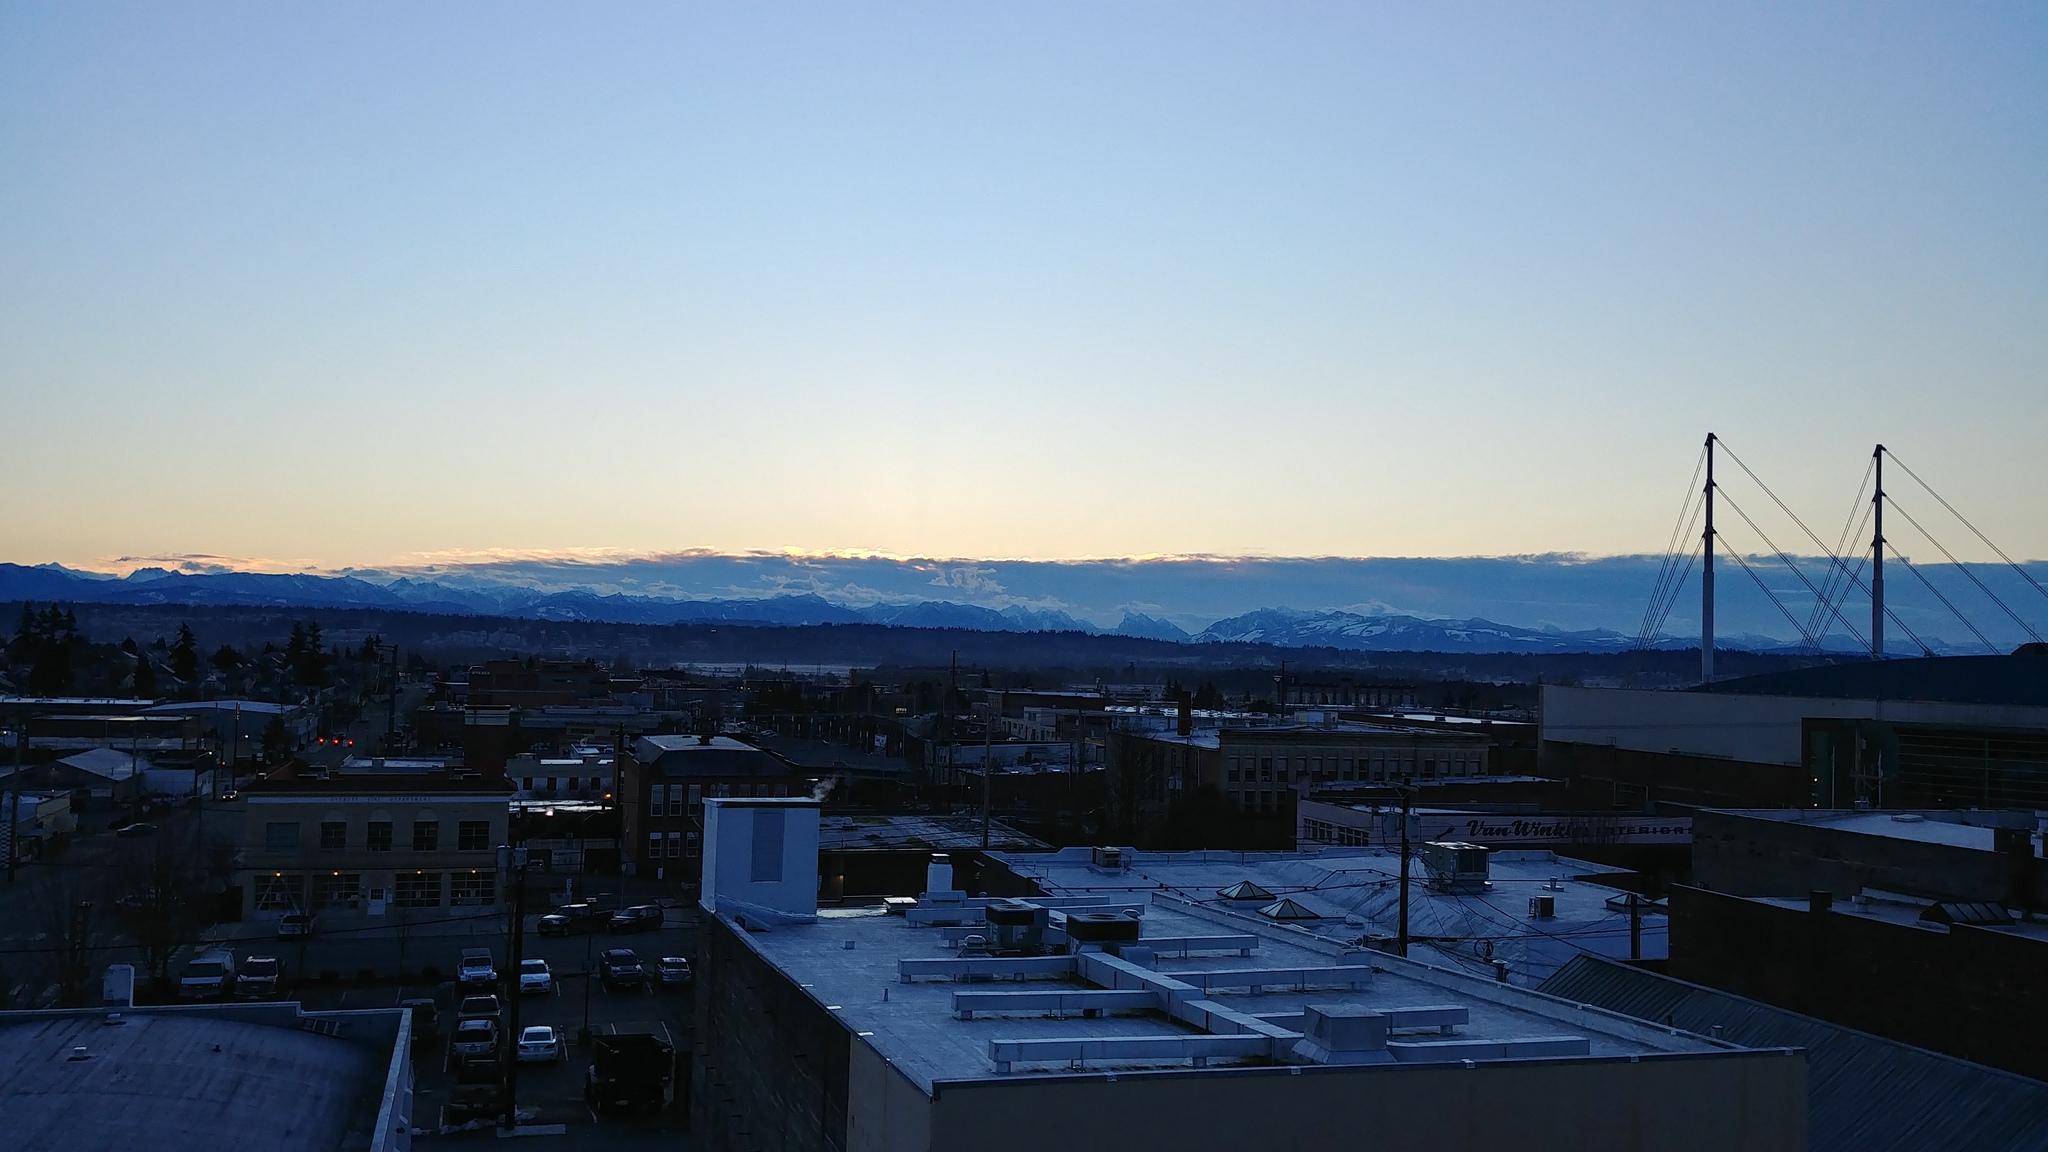 Valley view from Port Gardner Parking // Christopher Bragg